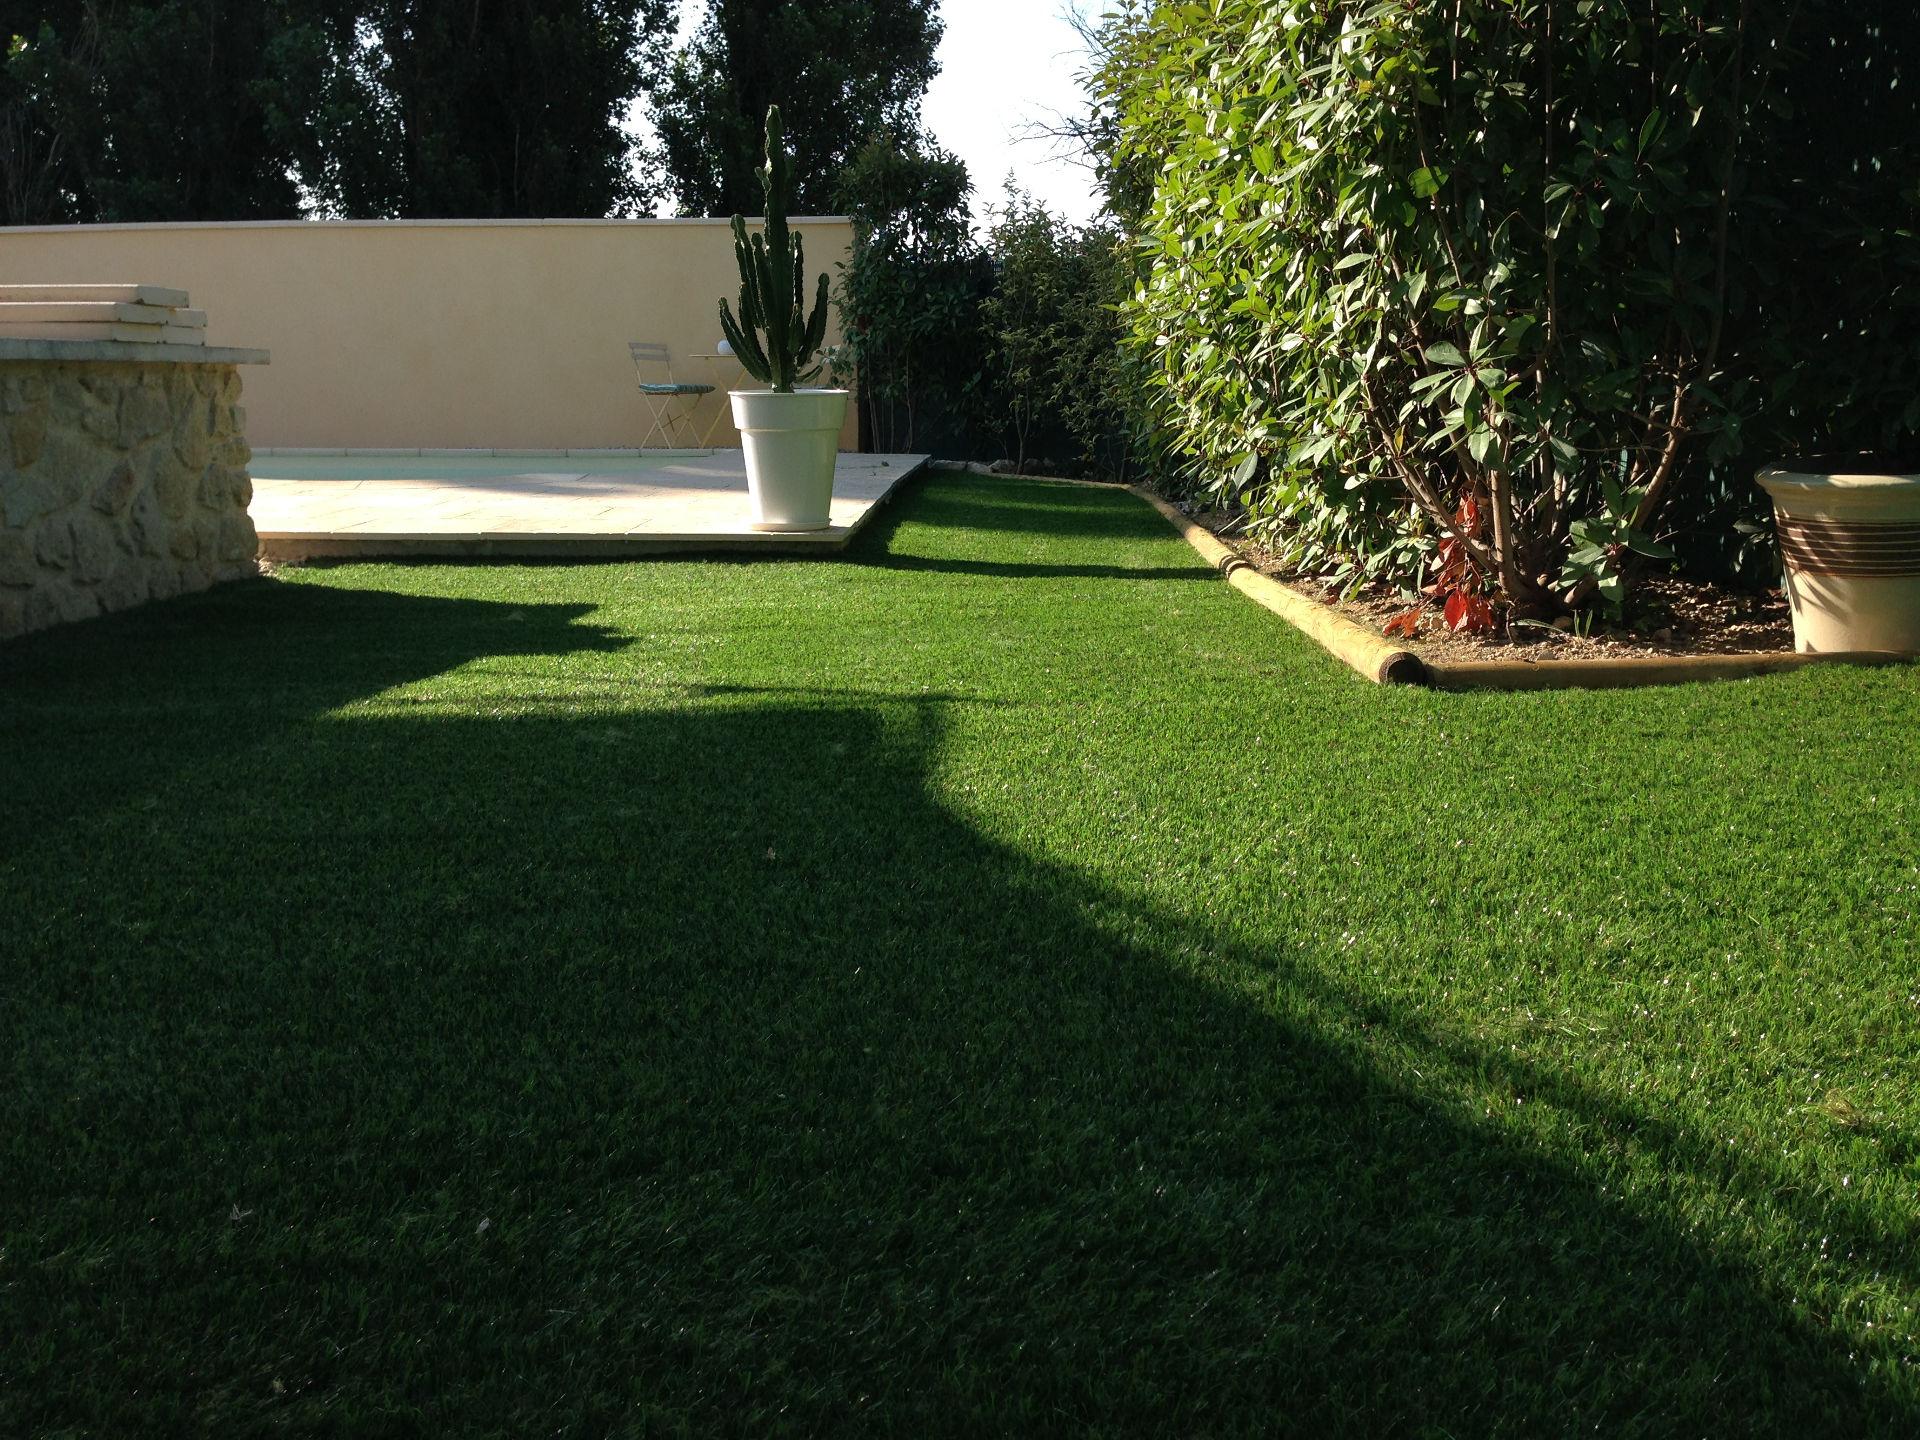 cr ation jardin en pelouse synth tique sports syst mes. Black Bedroom Furniture Sets. Home Design Ideas